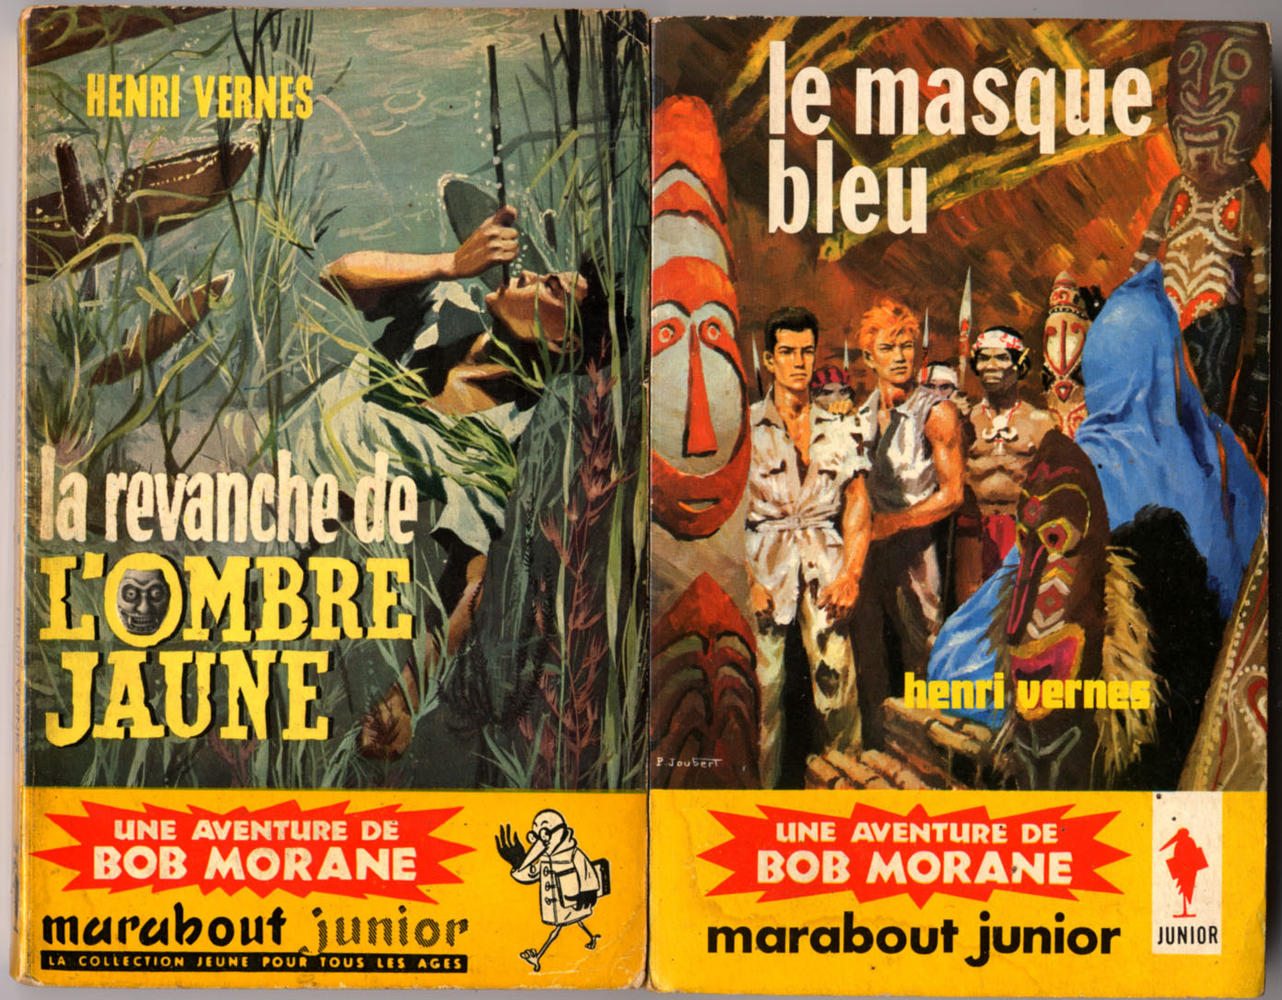 Henri Vernes - Bob morane : Les 70 premières aventures